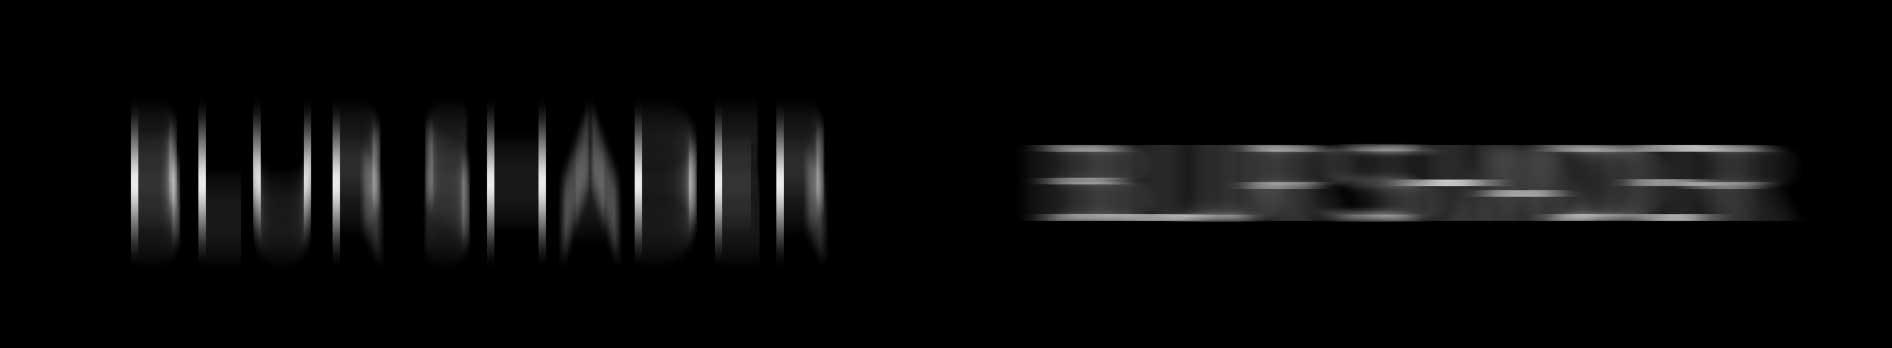 Blur-Example2